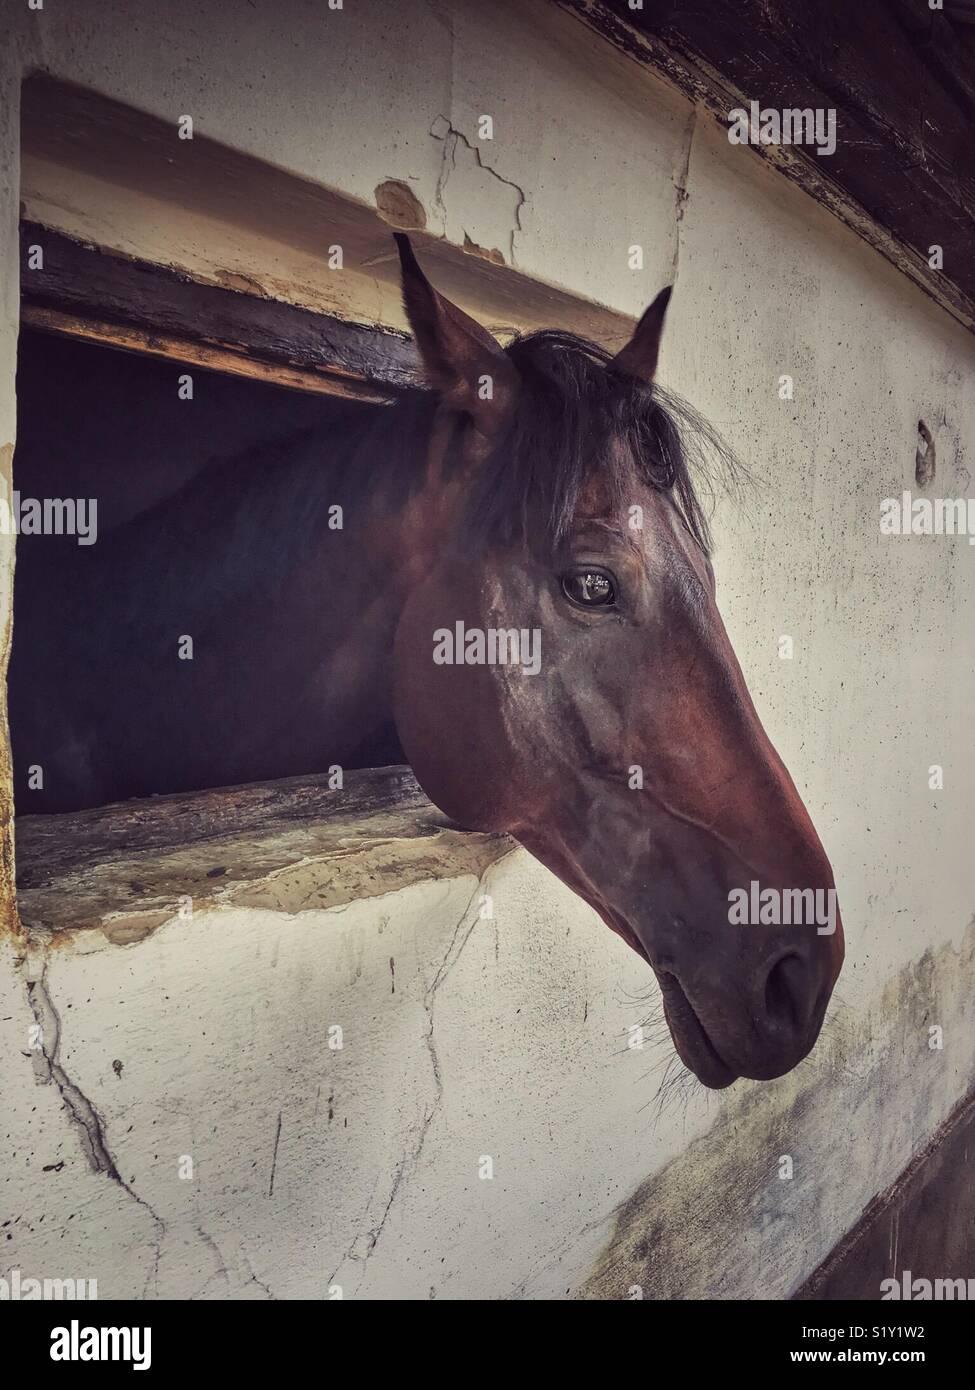 horse head through the barn window - Stock Image